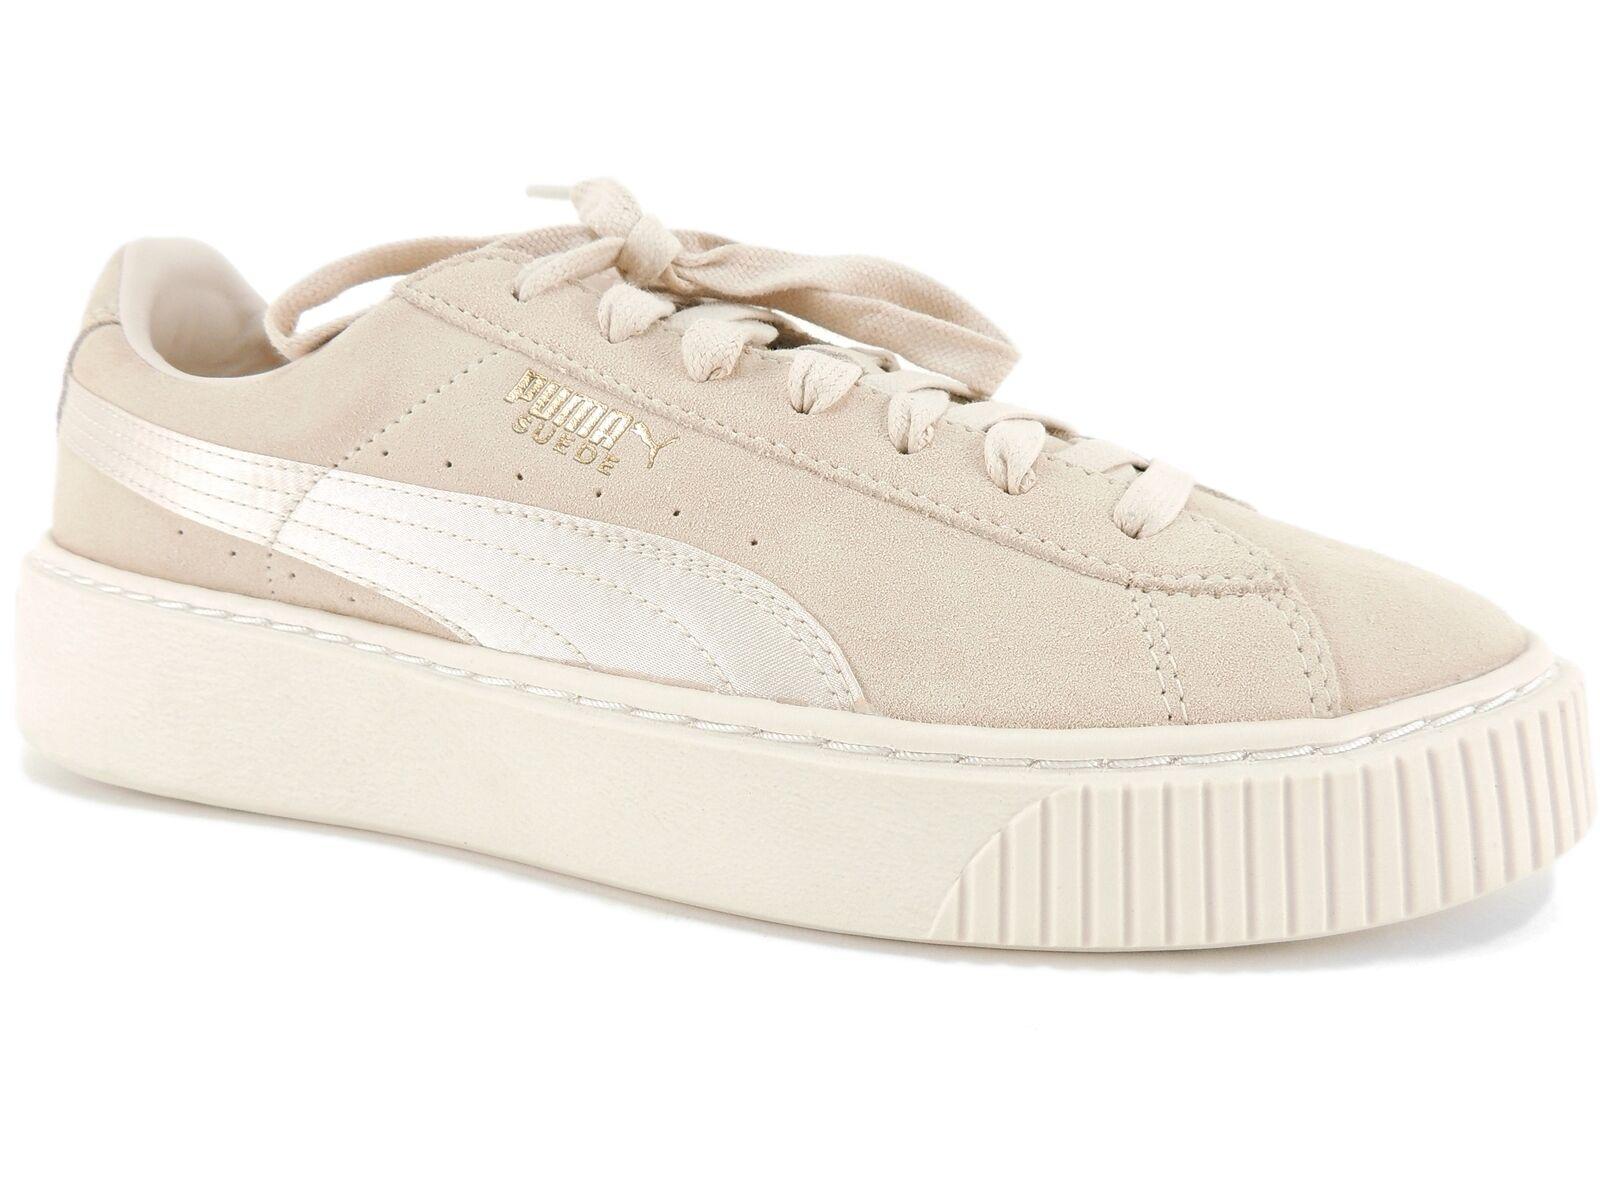 PUMA Women's Suede Platform Mono Satin Sneakers Pink Tint-Whisper  White-Gold 10M